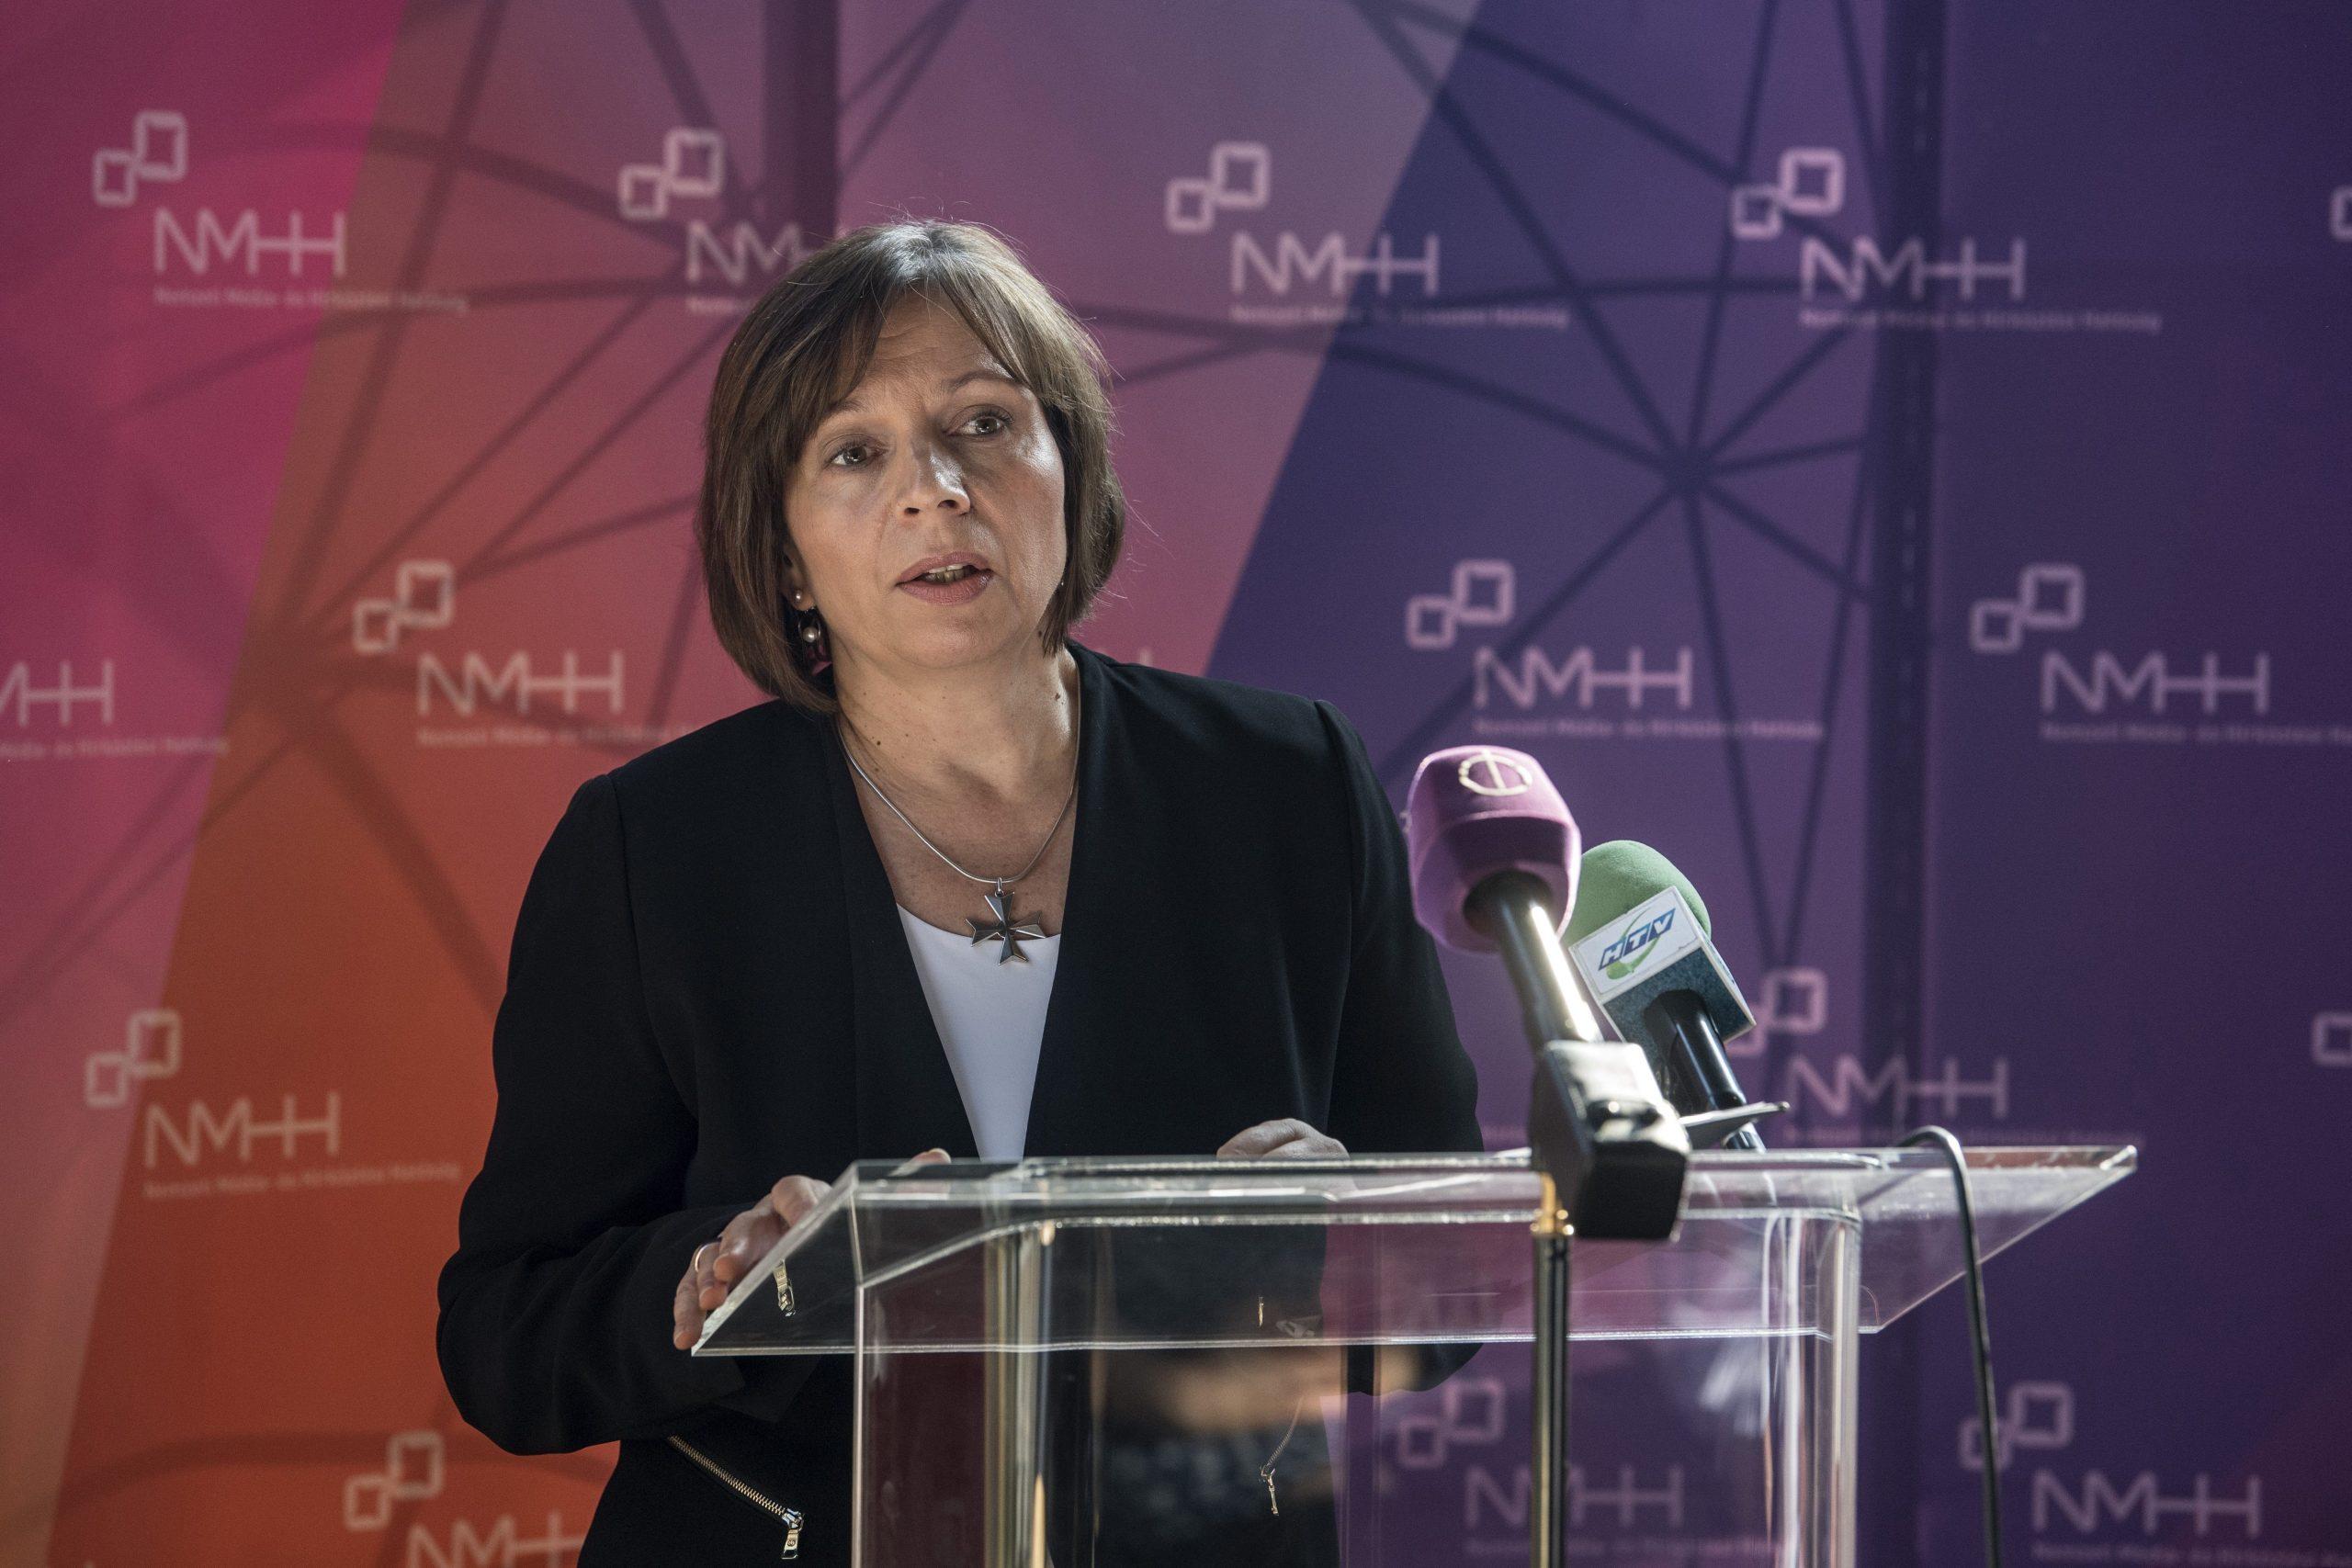 Media Council Head on Klubrádió Case: 'I Believe in the Rule of Law'